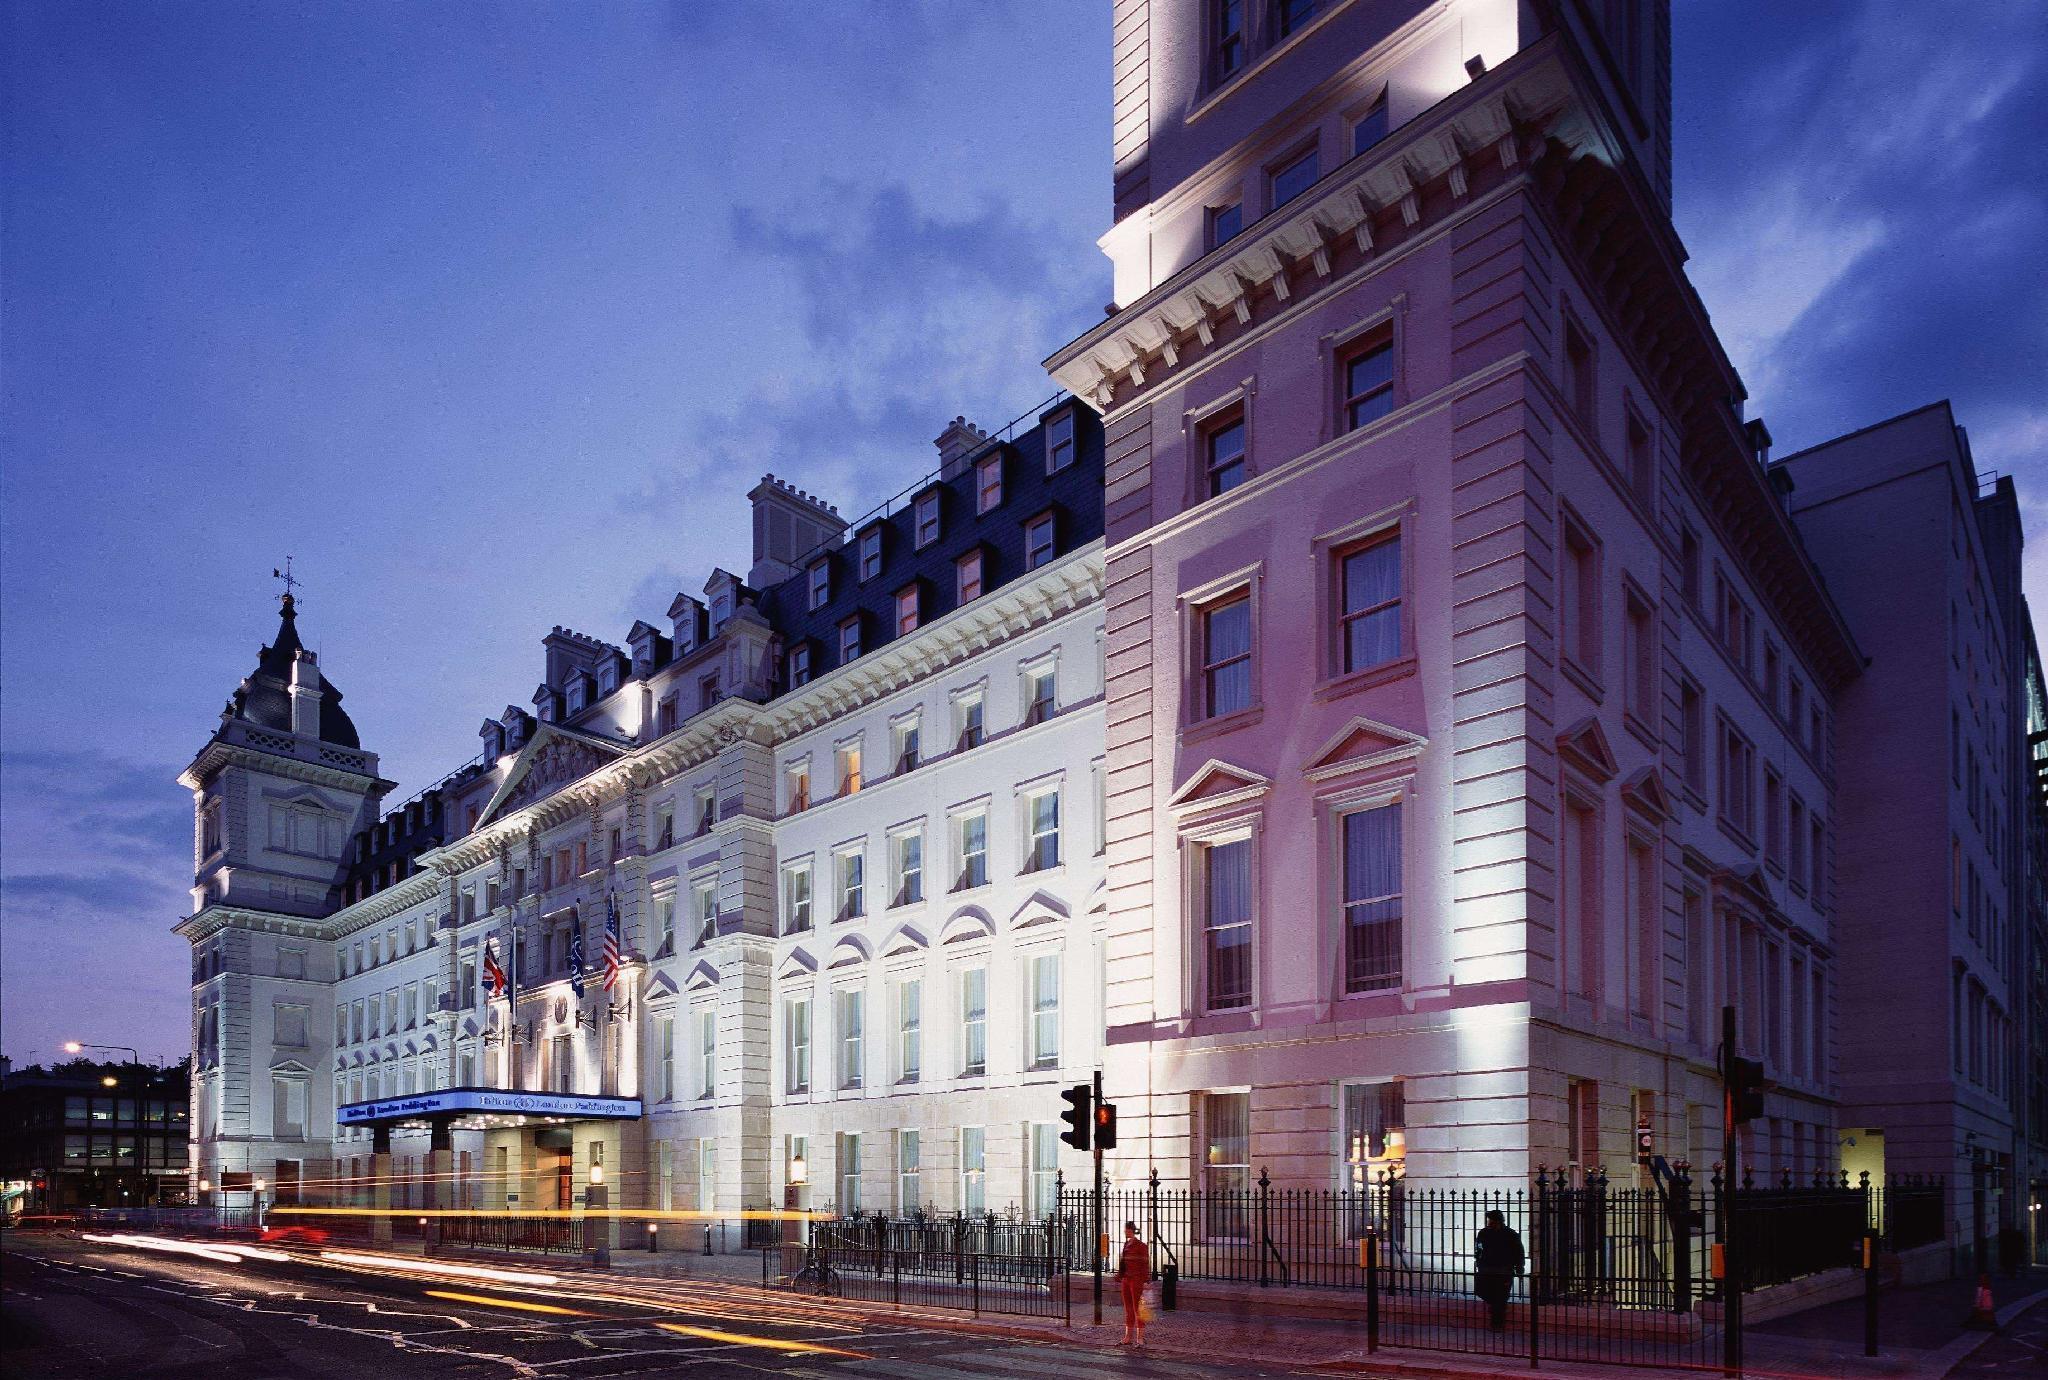 Burnham Beeches Hotel London : trenutna potvrda i niske cijene za London Burnham Beeches Hotel uz Agodu.